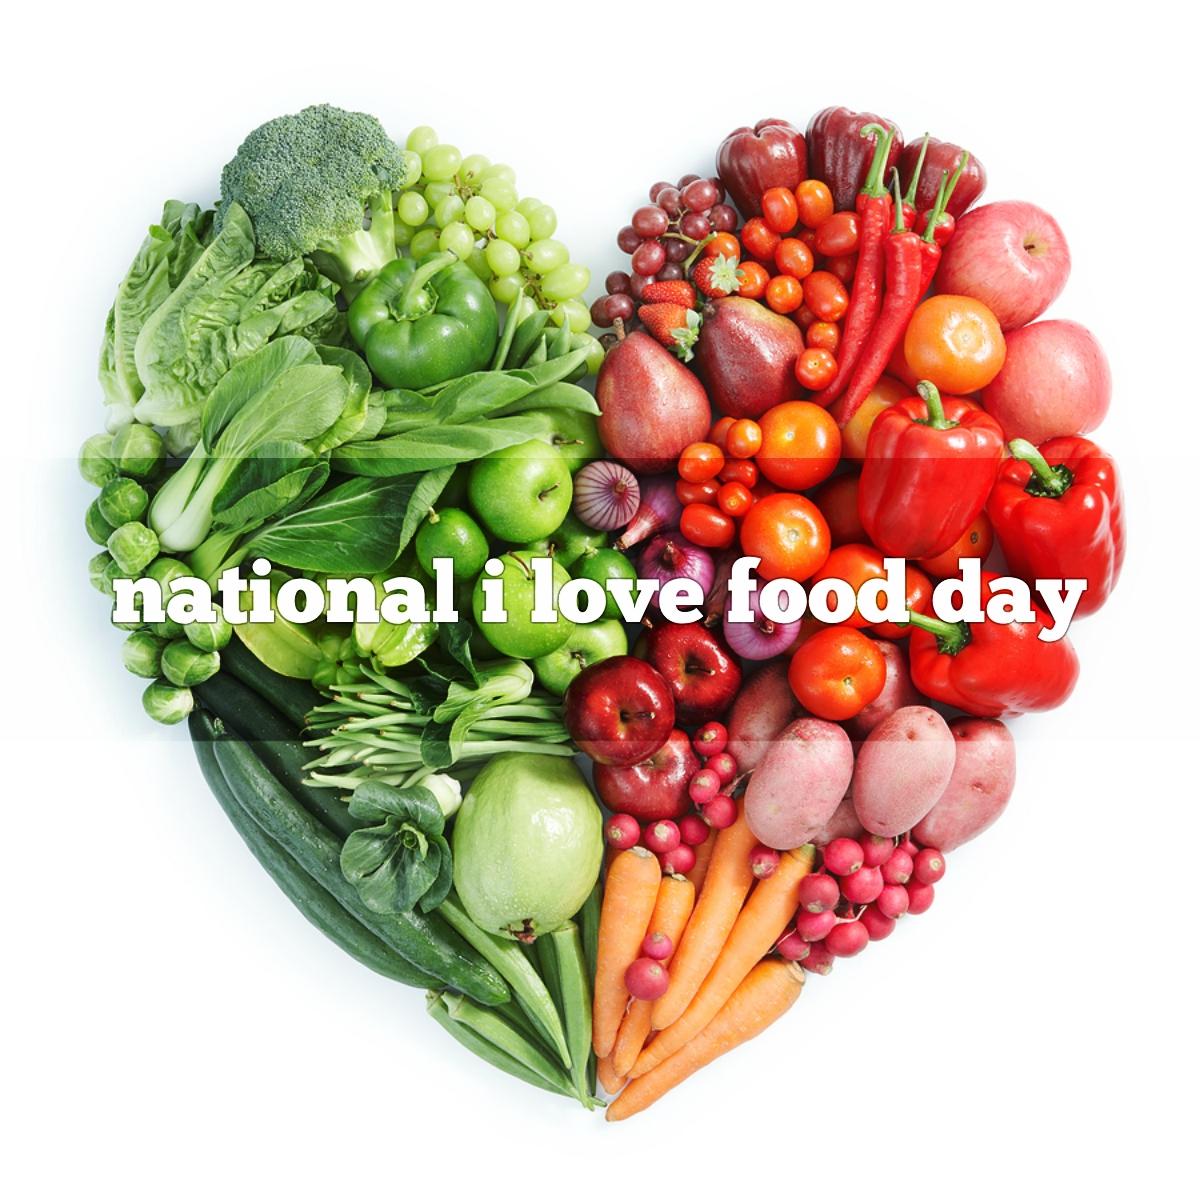 National Food Holidays In September